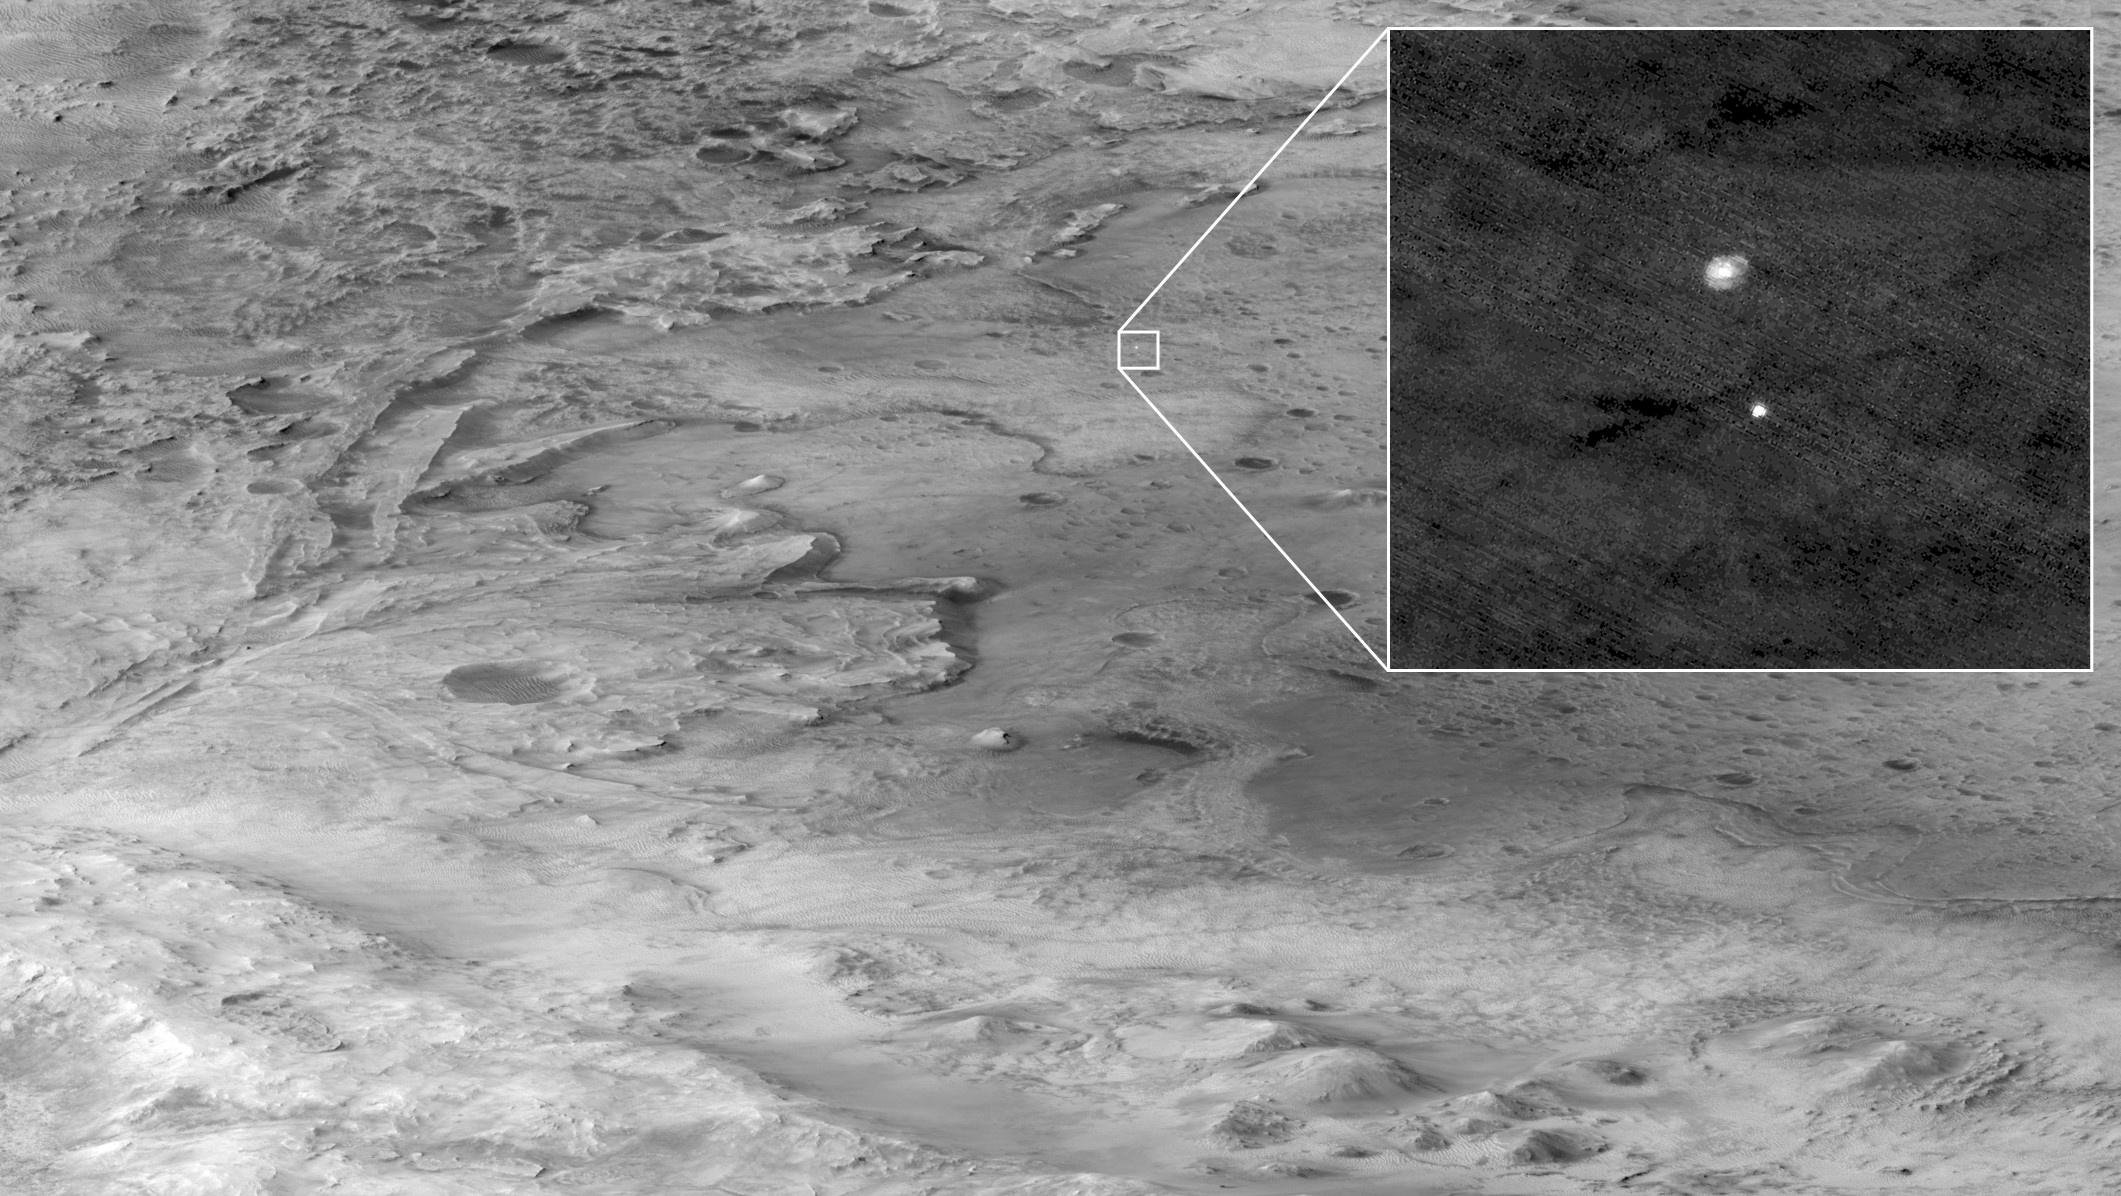 La cámara High Resolution Imaging Experiment (HiRISE) de la sonda que orbita Marte, Mars Reconnaissance Orbiter fotografía el descenso de Perseverance en paracaídas - NASA/JPL-Caltech/Handout via REUTERS